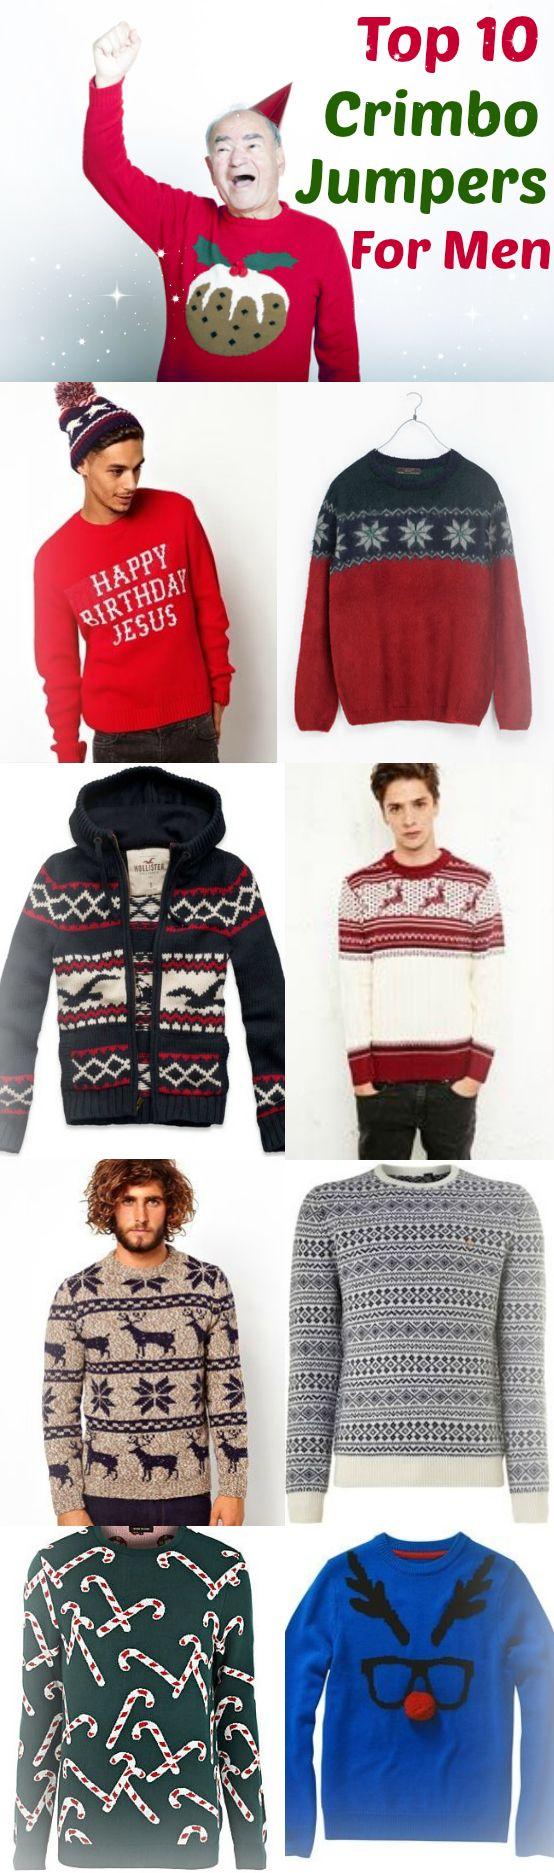 Best 25+ Mens christmas jumpers ideas on Pinterest | Christmas present  jumper, Mens funny christmas jumpers and Bridget jones diary 3